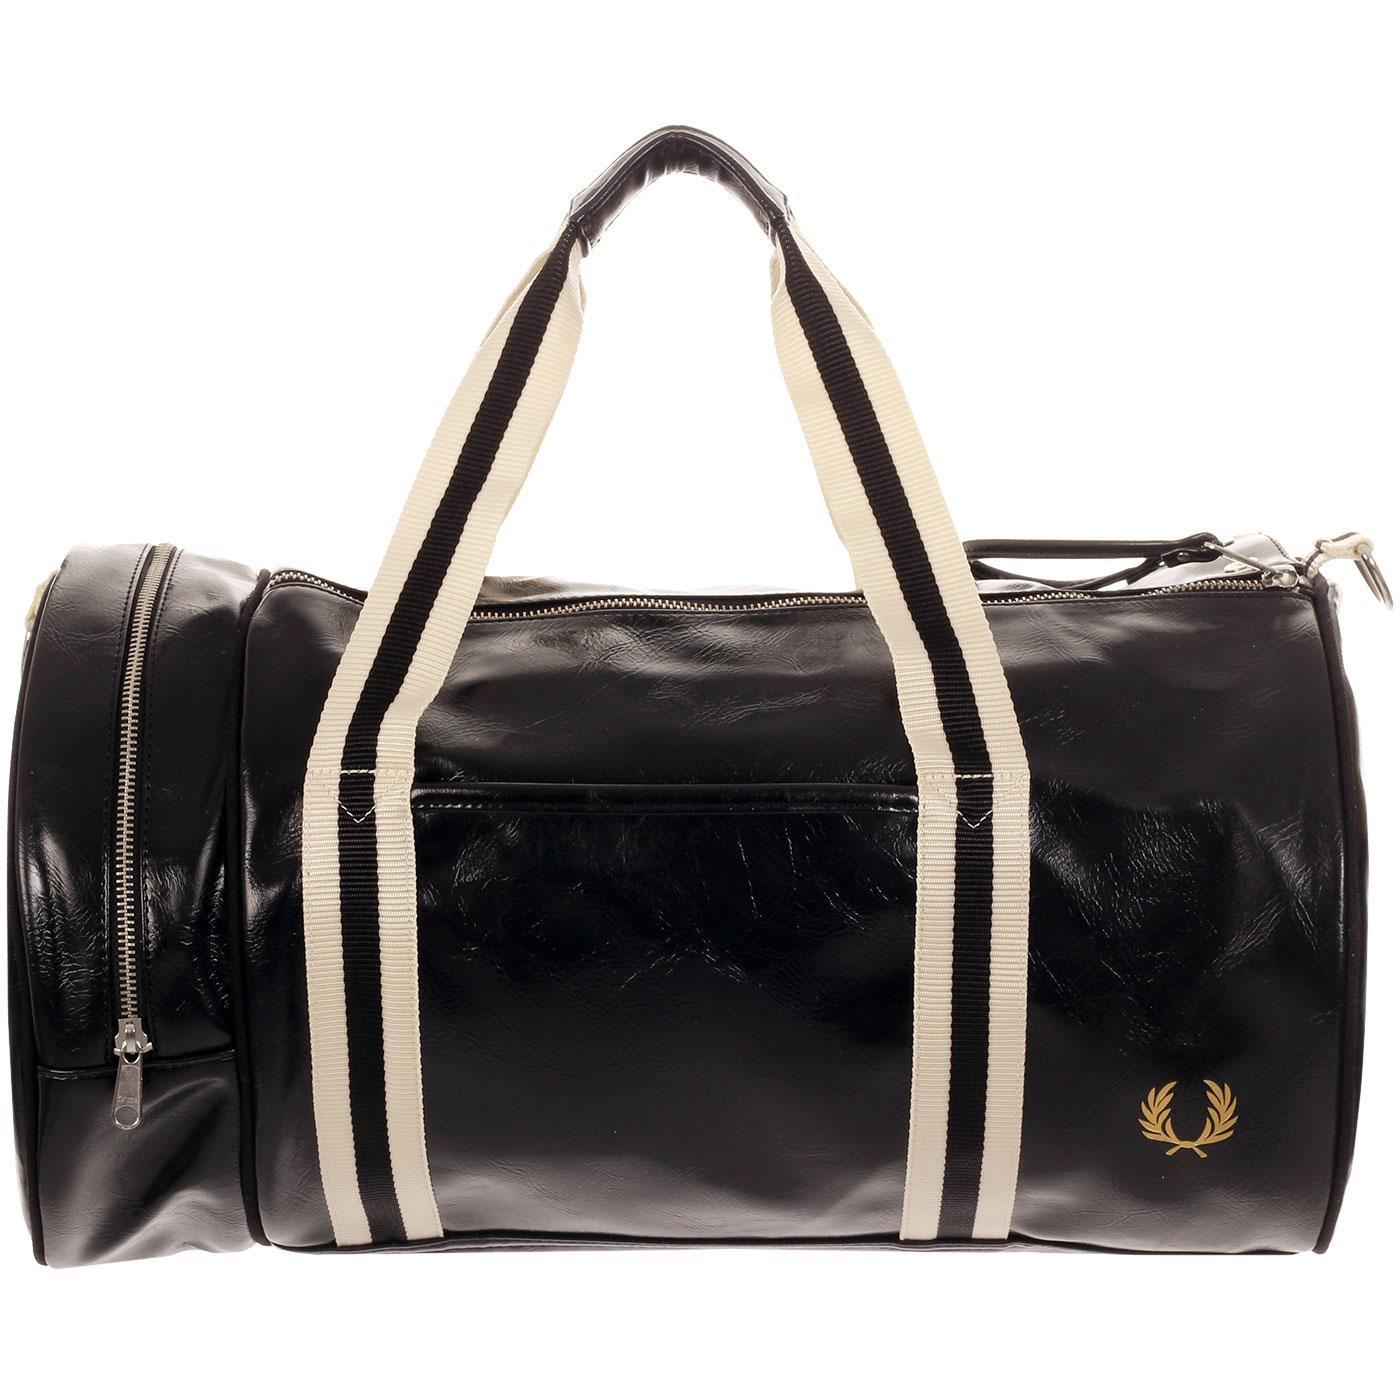 FRED PERRY Classic Retro Barrel Bag - Black/Gold